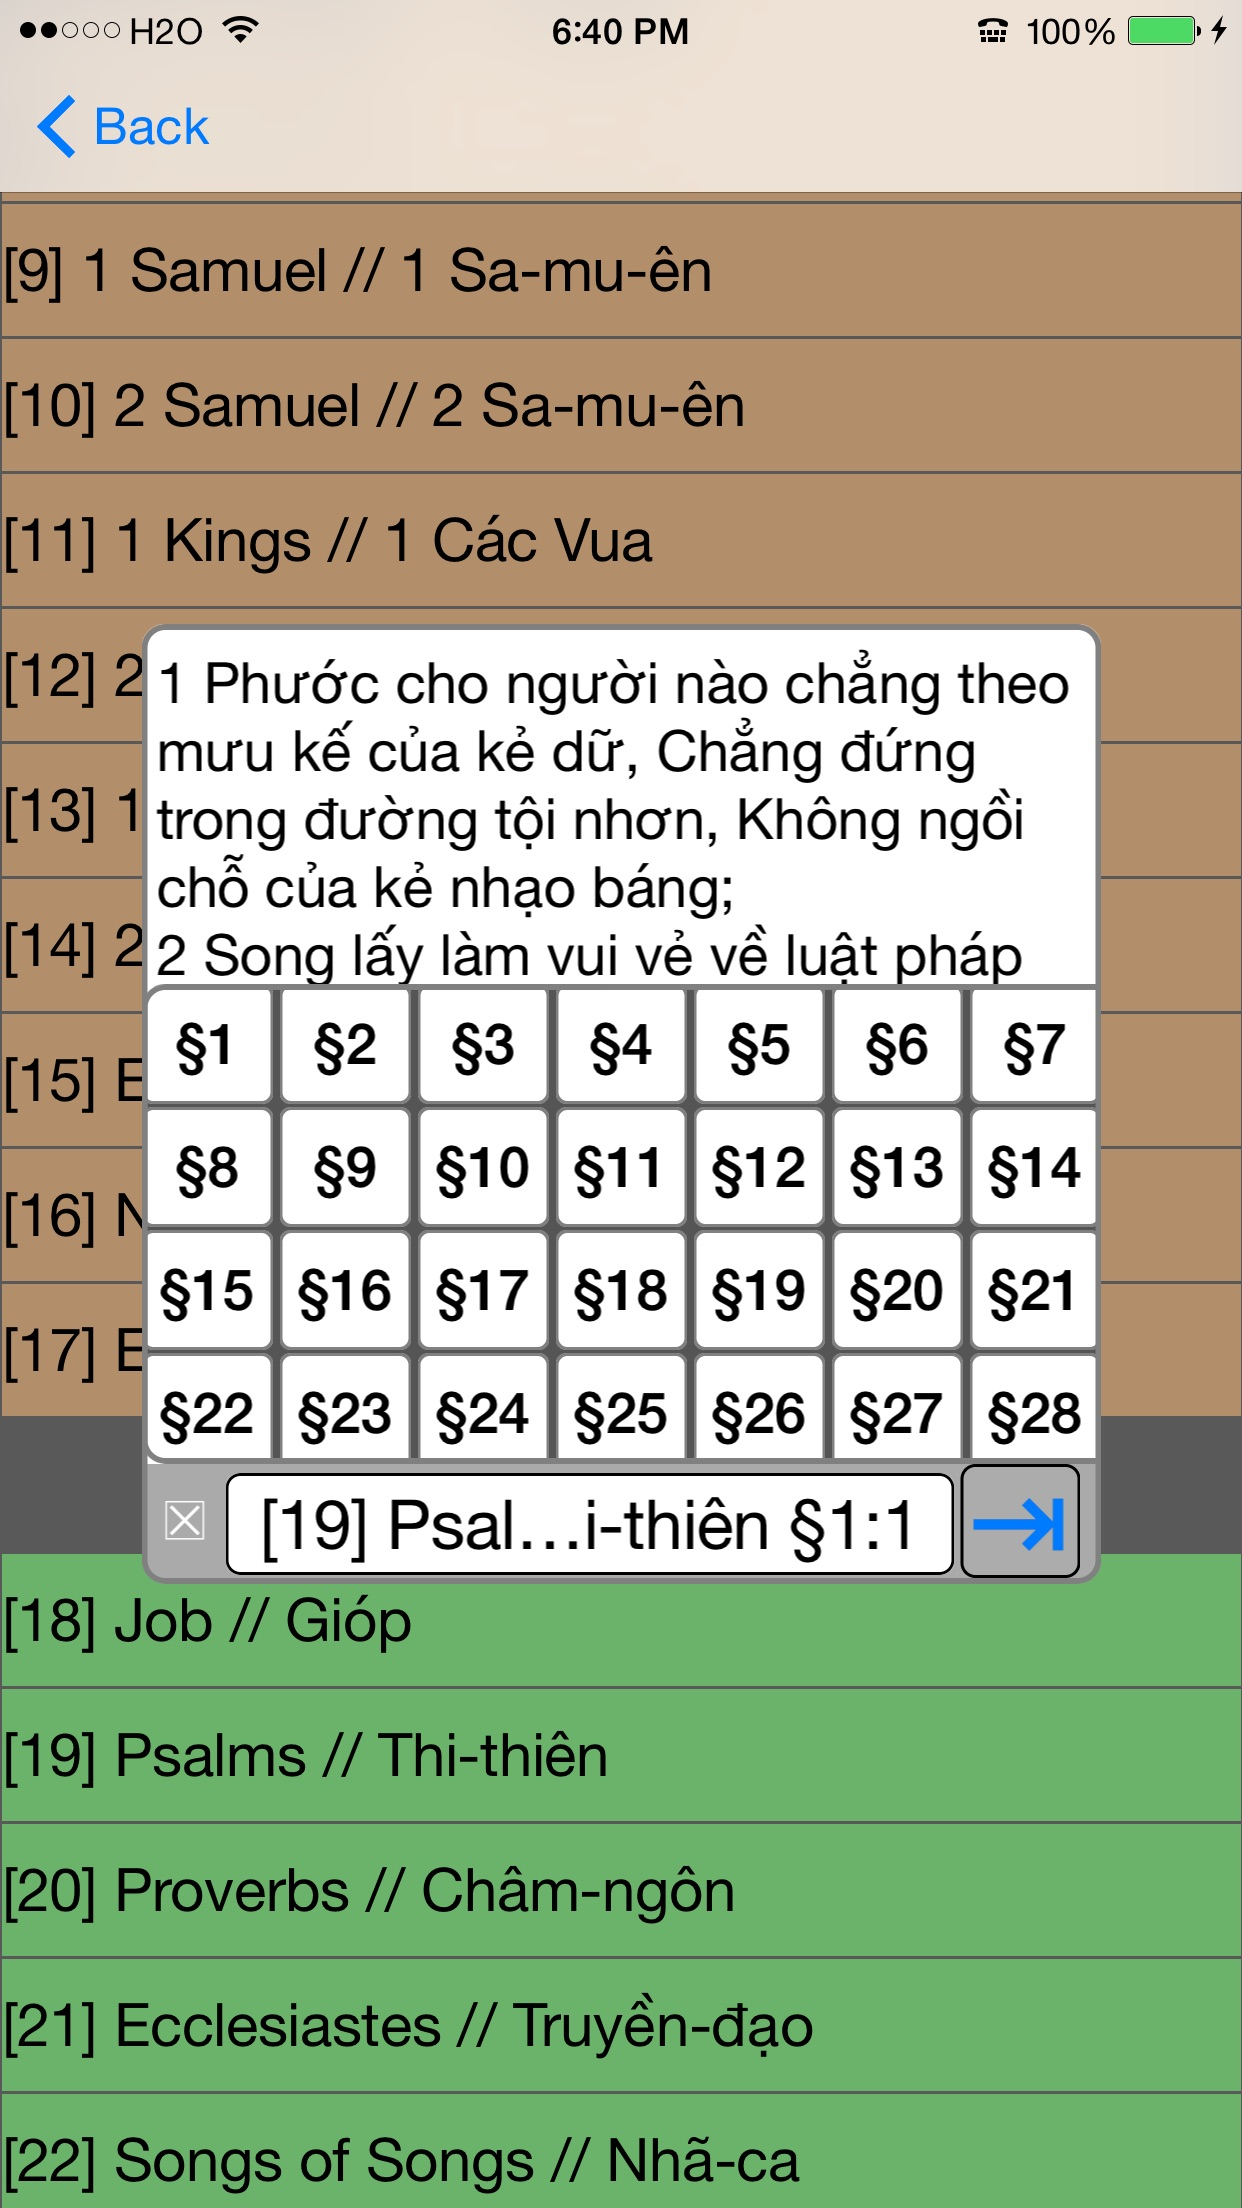 Kinh Thanh (Vietnamese Bible) Screenshot